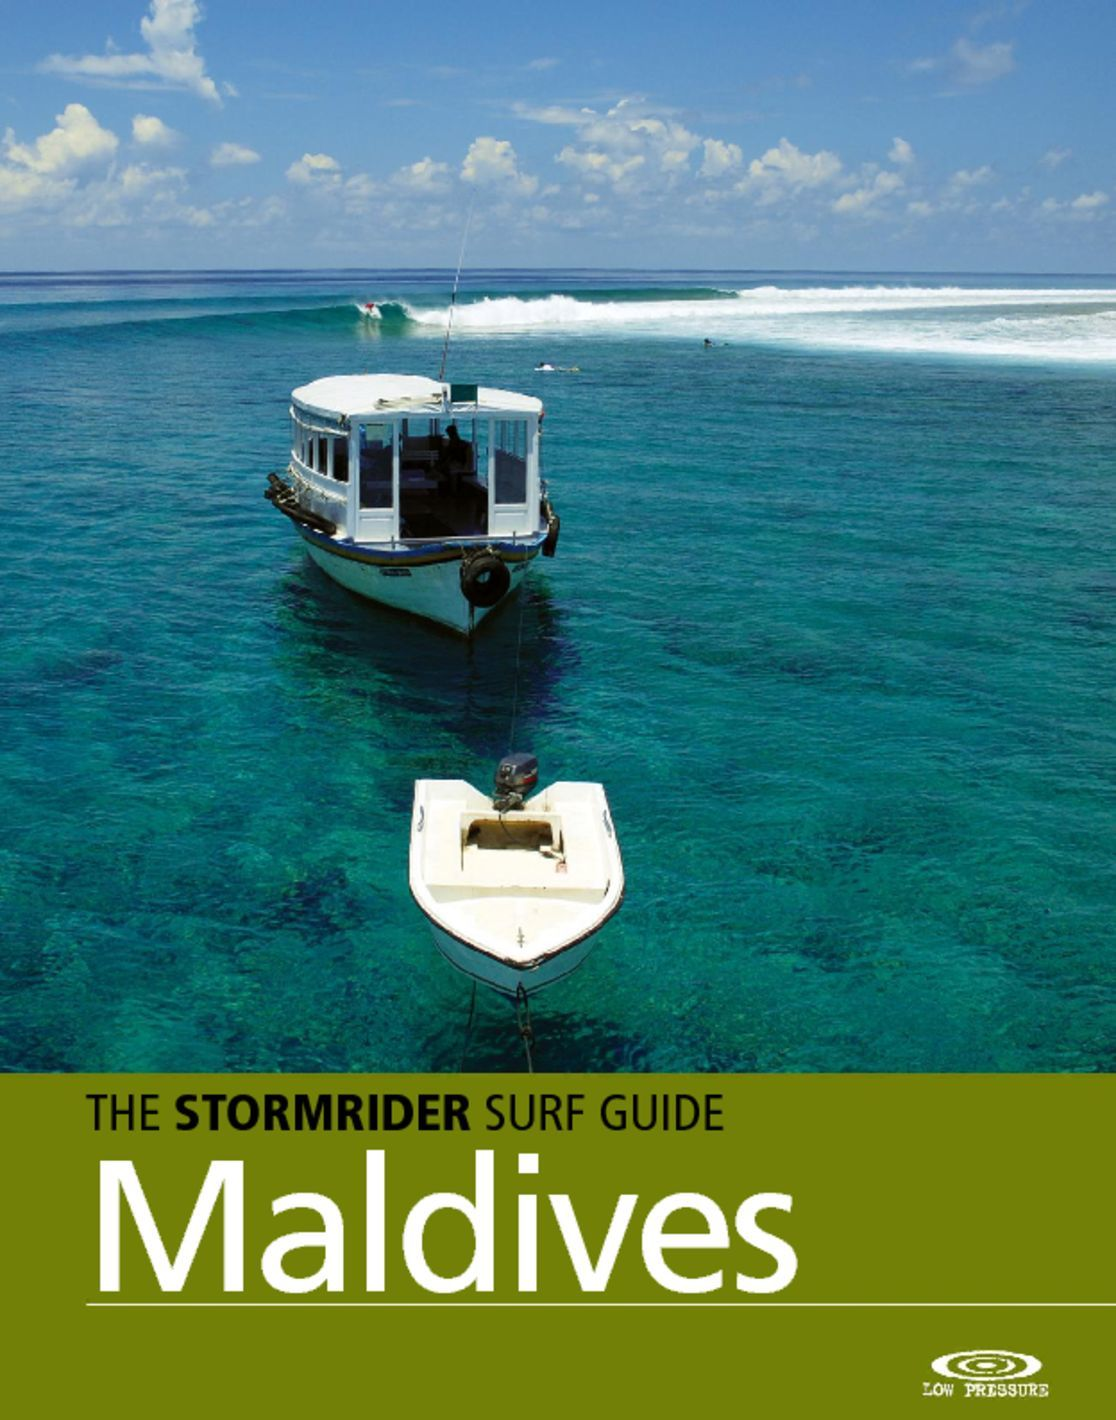 The Stormrider Surf Guide Maldives Digital